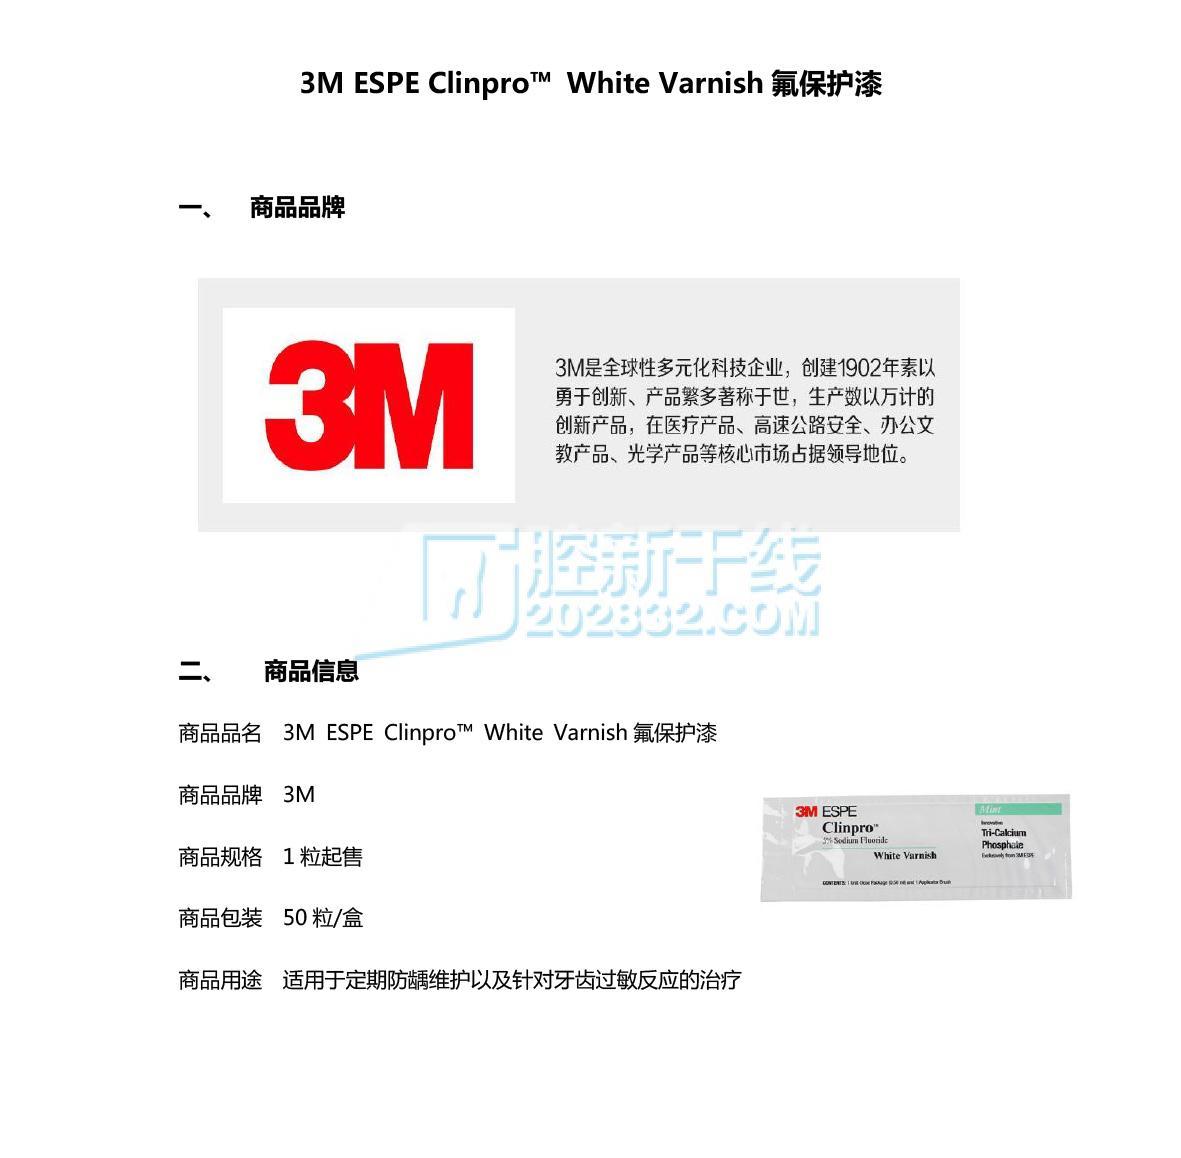 3M ESPE Clinpro™ White Varnish氟保护漆-1粒 1(每粒含0.jpg